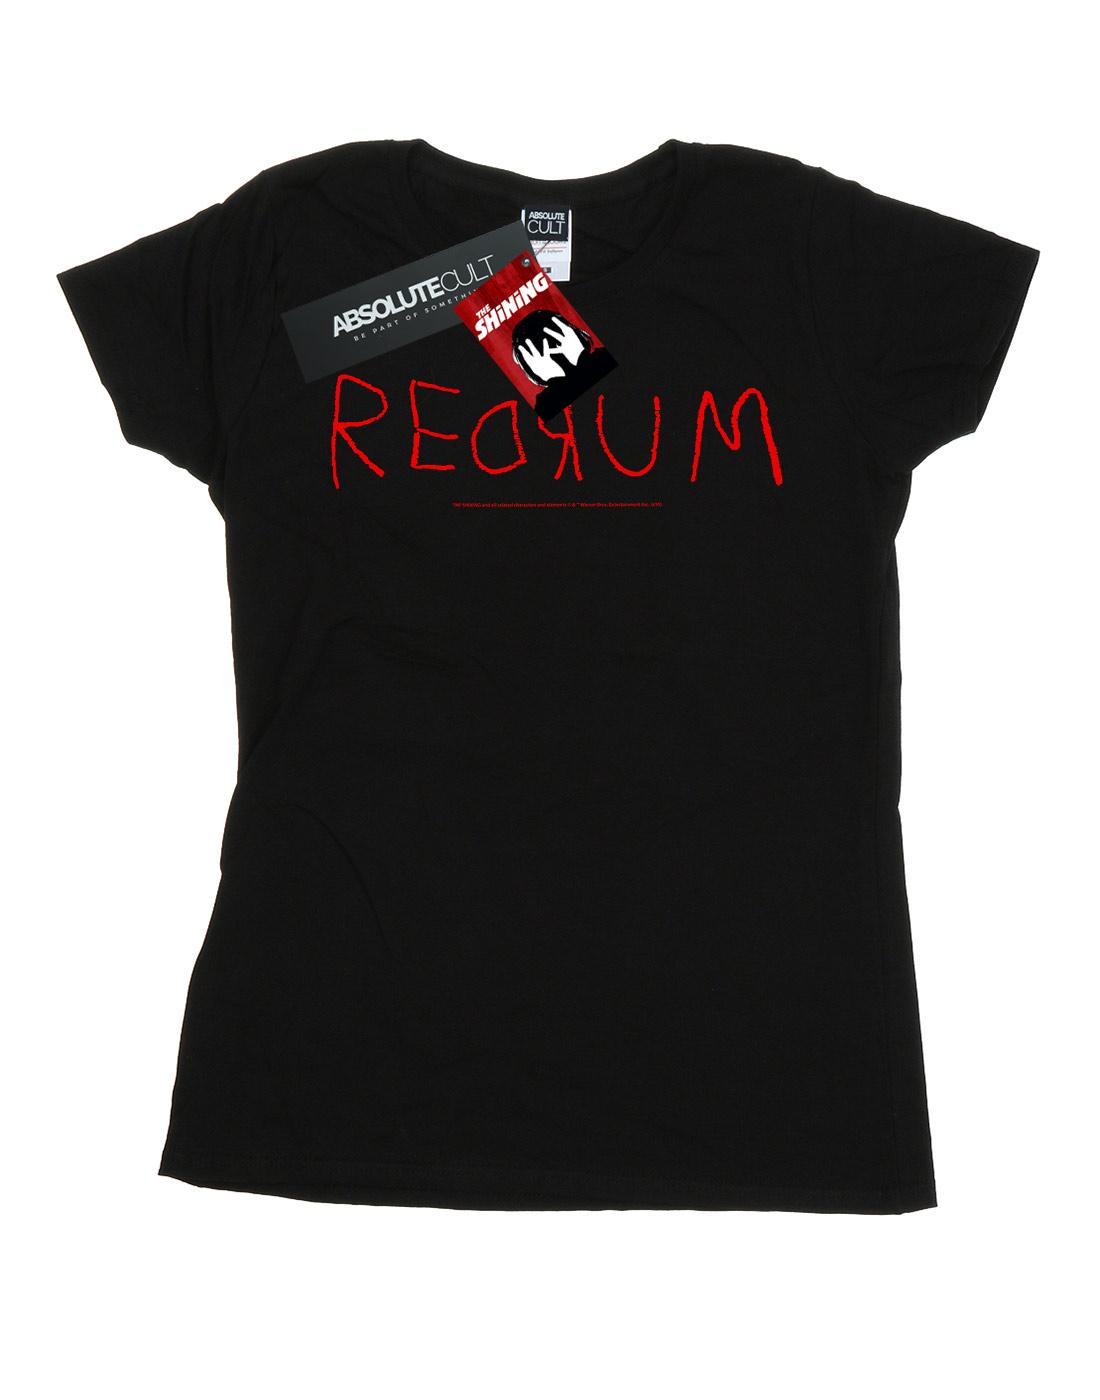 The-Shining-Women-039-s-Redrum-Text-T-Shirt thumbnail 5